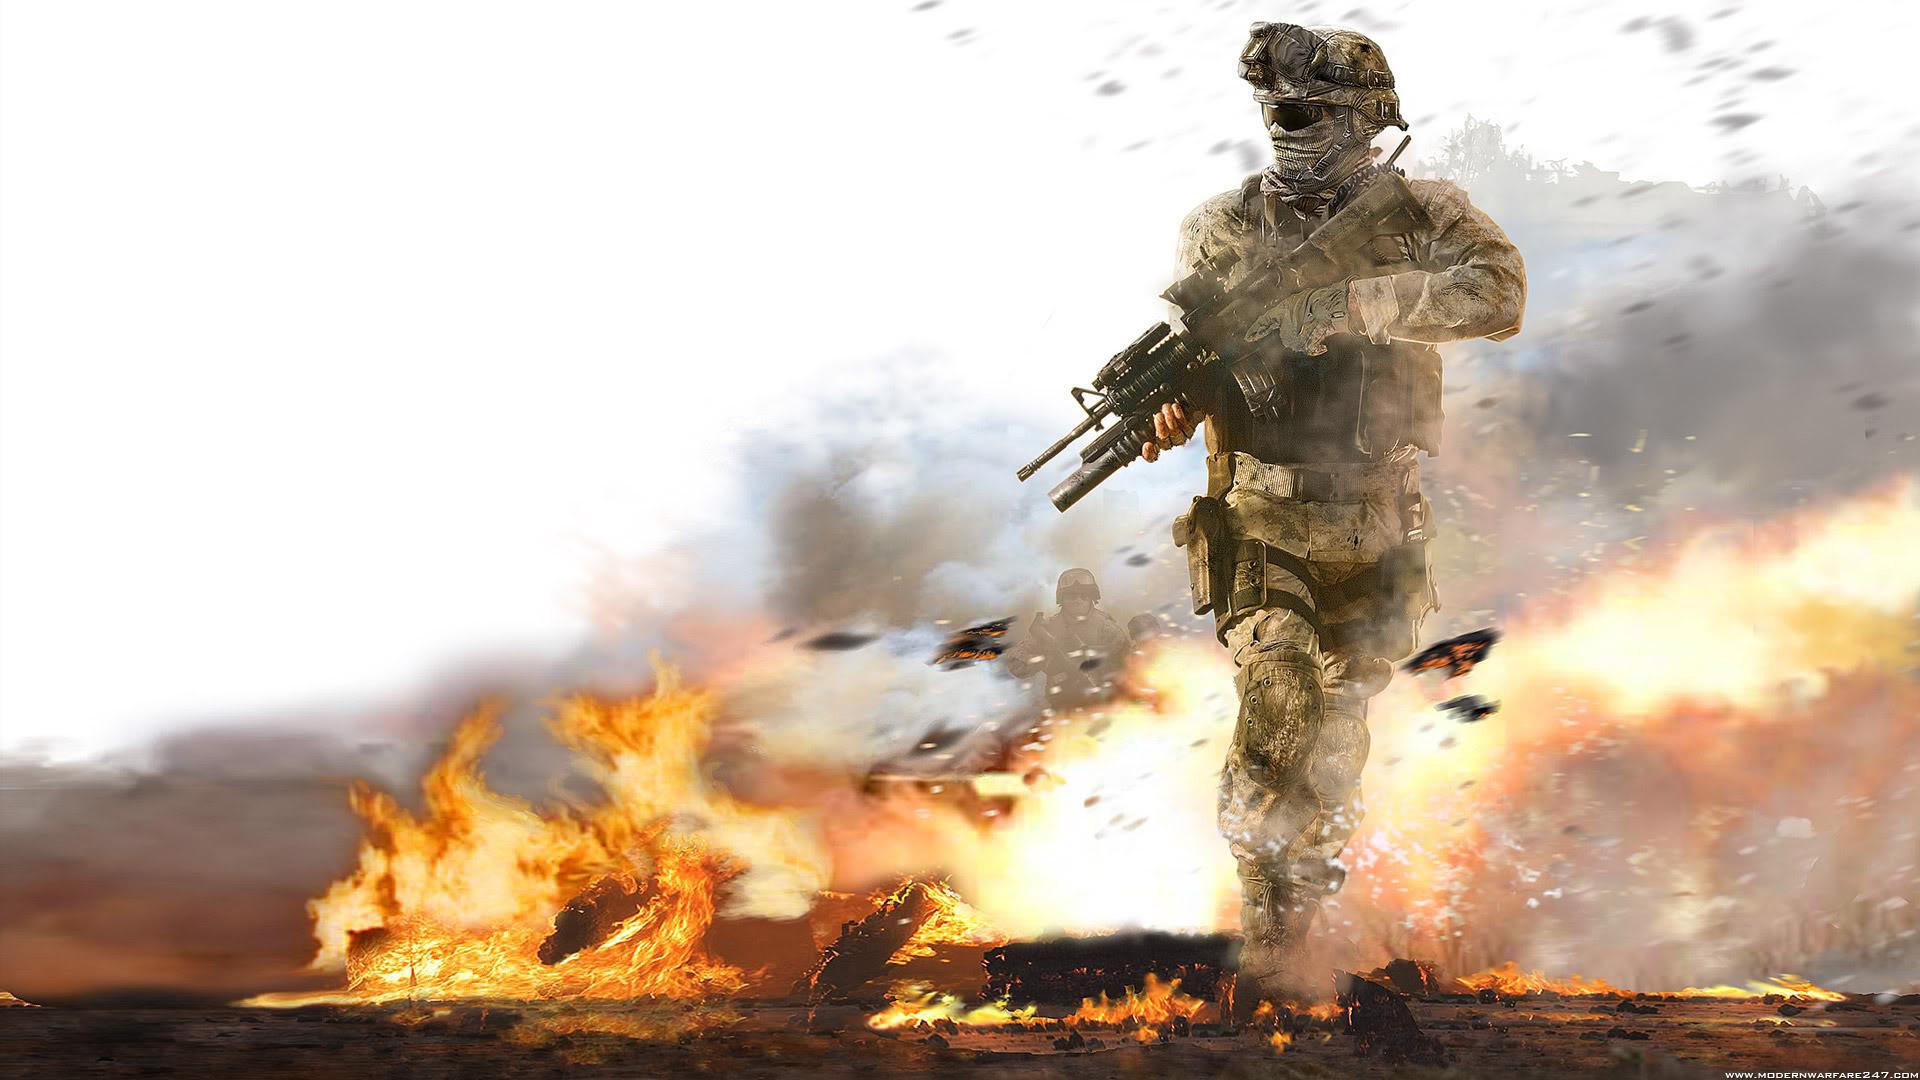 War Army HD Wallpapers, Free Wallpaper Downloads, War Army HD 1920×1080 Army  Wallpapers (42 Wallpapers) | Adorable Wallpapers | Desktop | Pinterest |  Army …